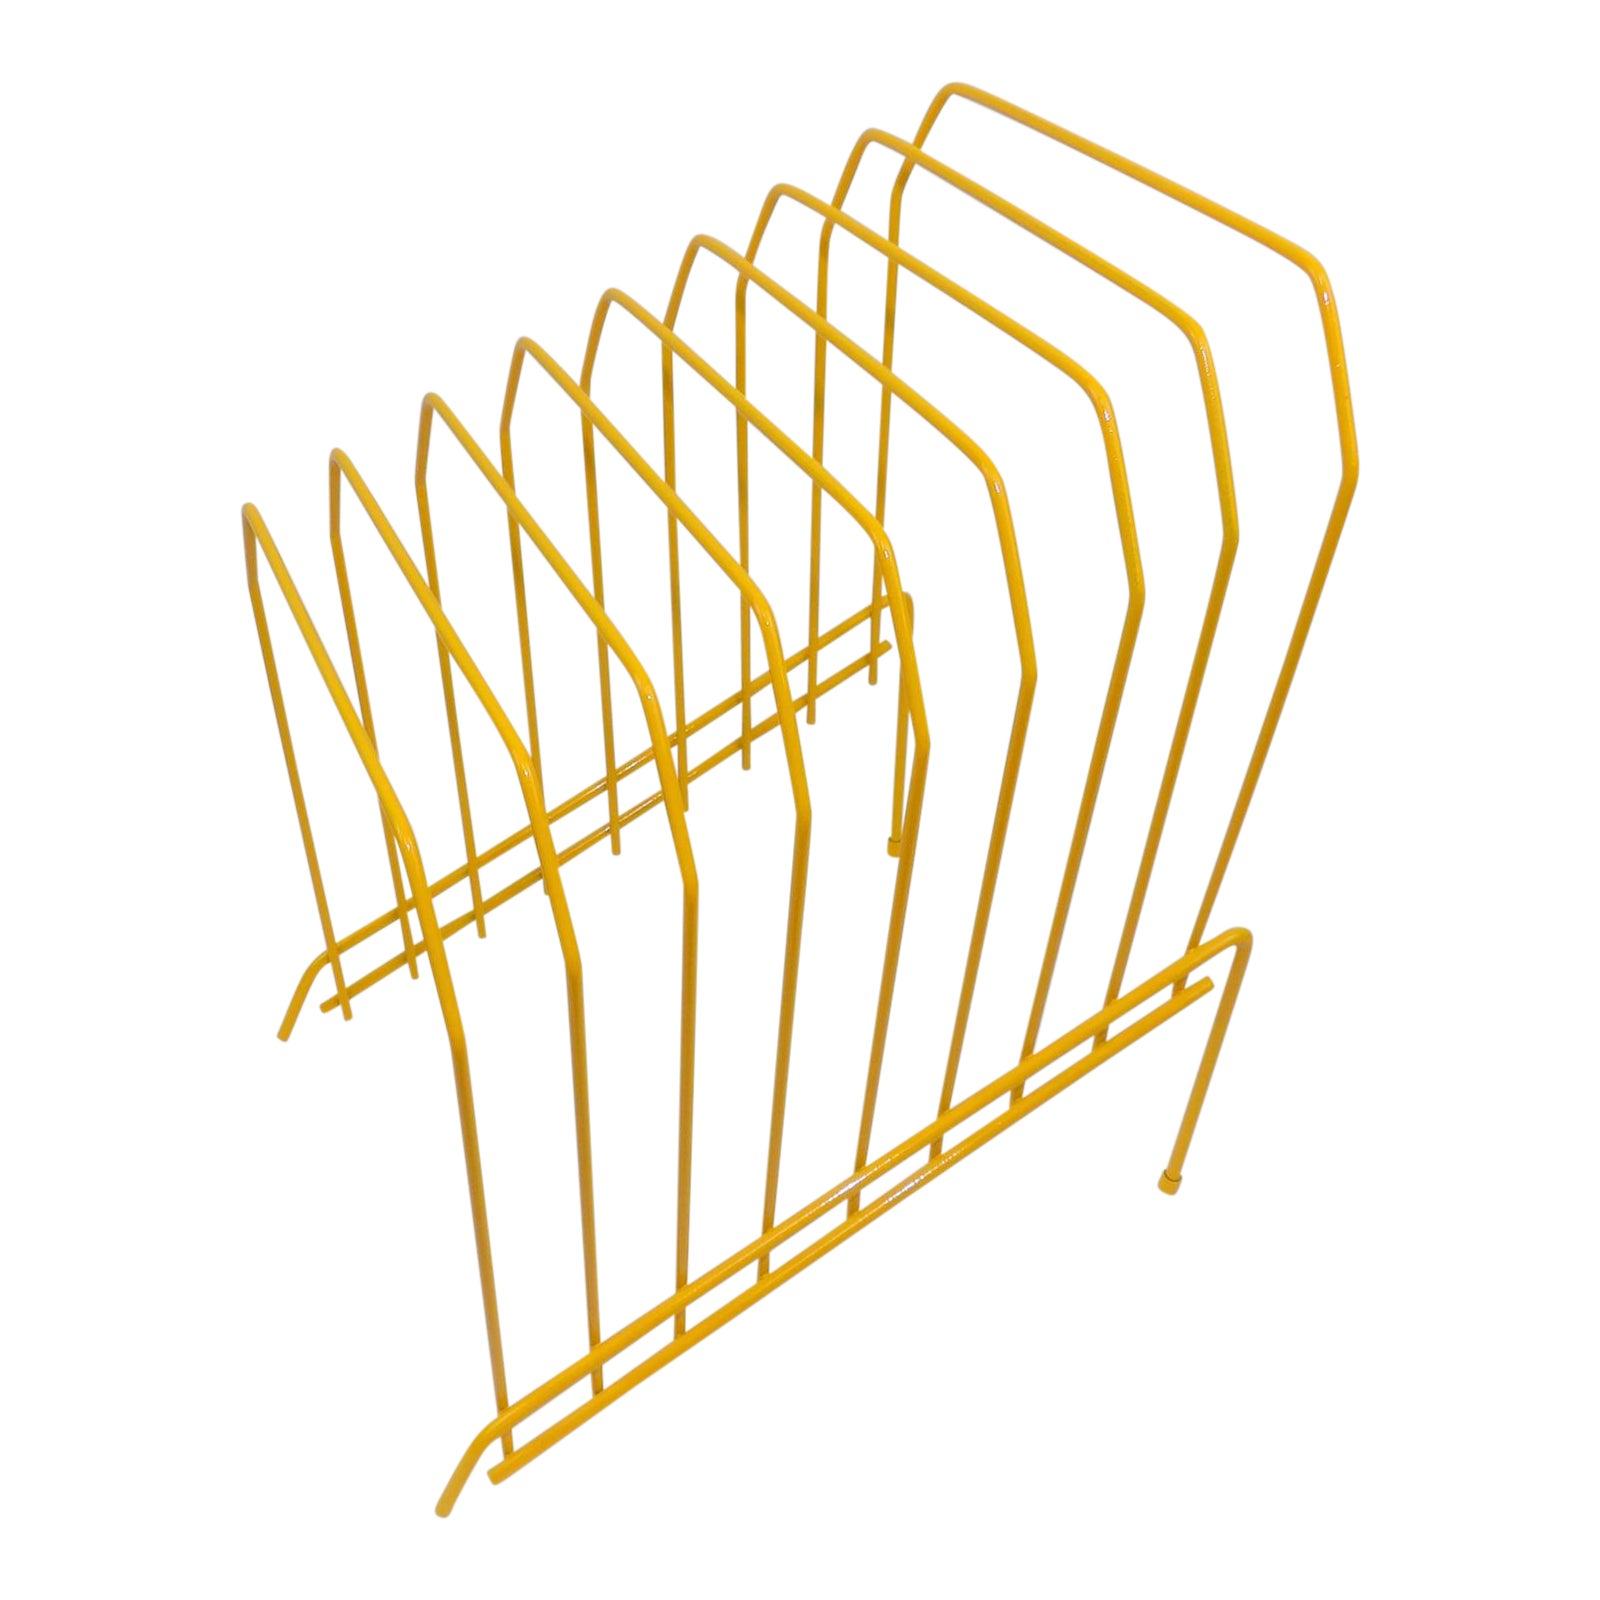 Yellow Metal Mail File Holder - Vinyl Record Rack | Chairish